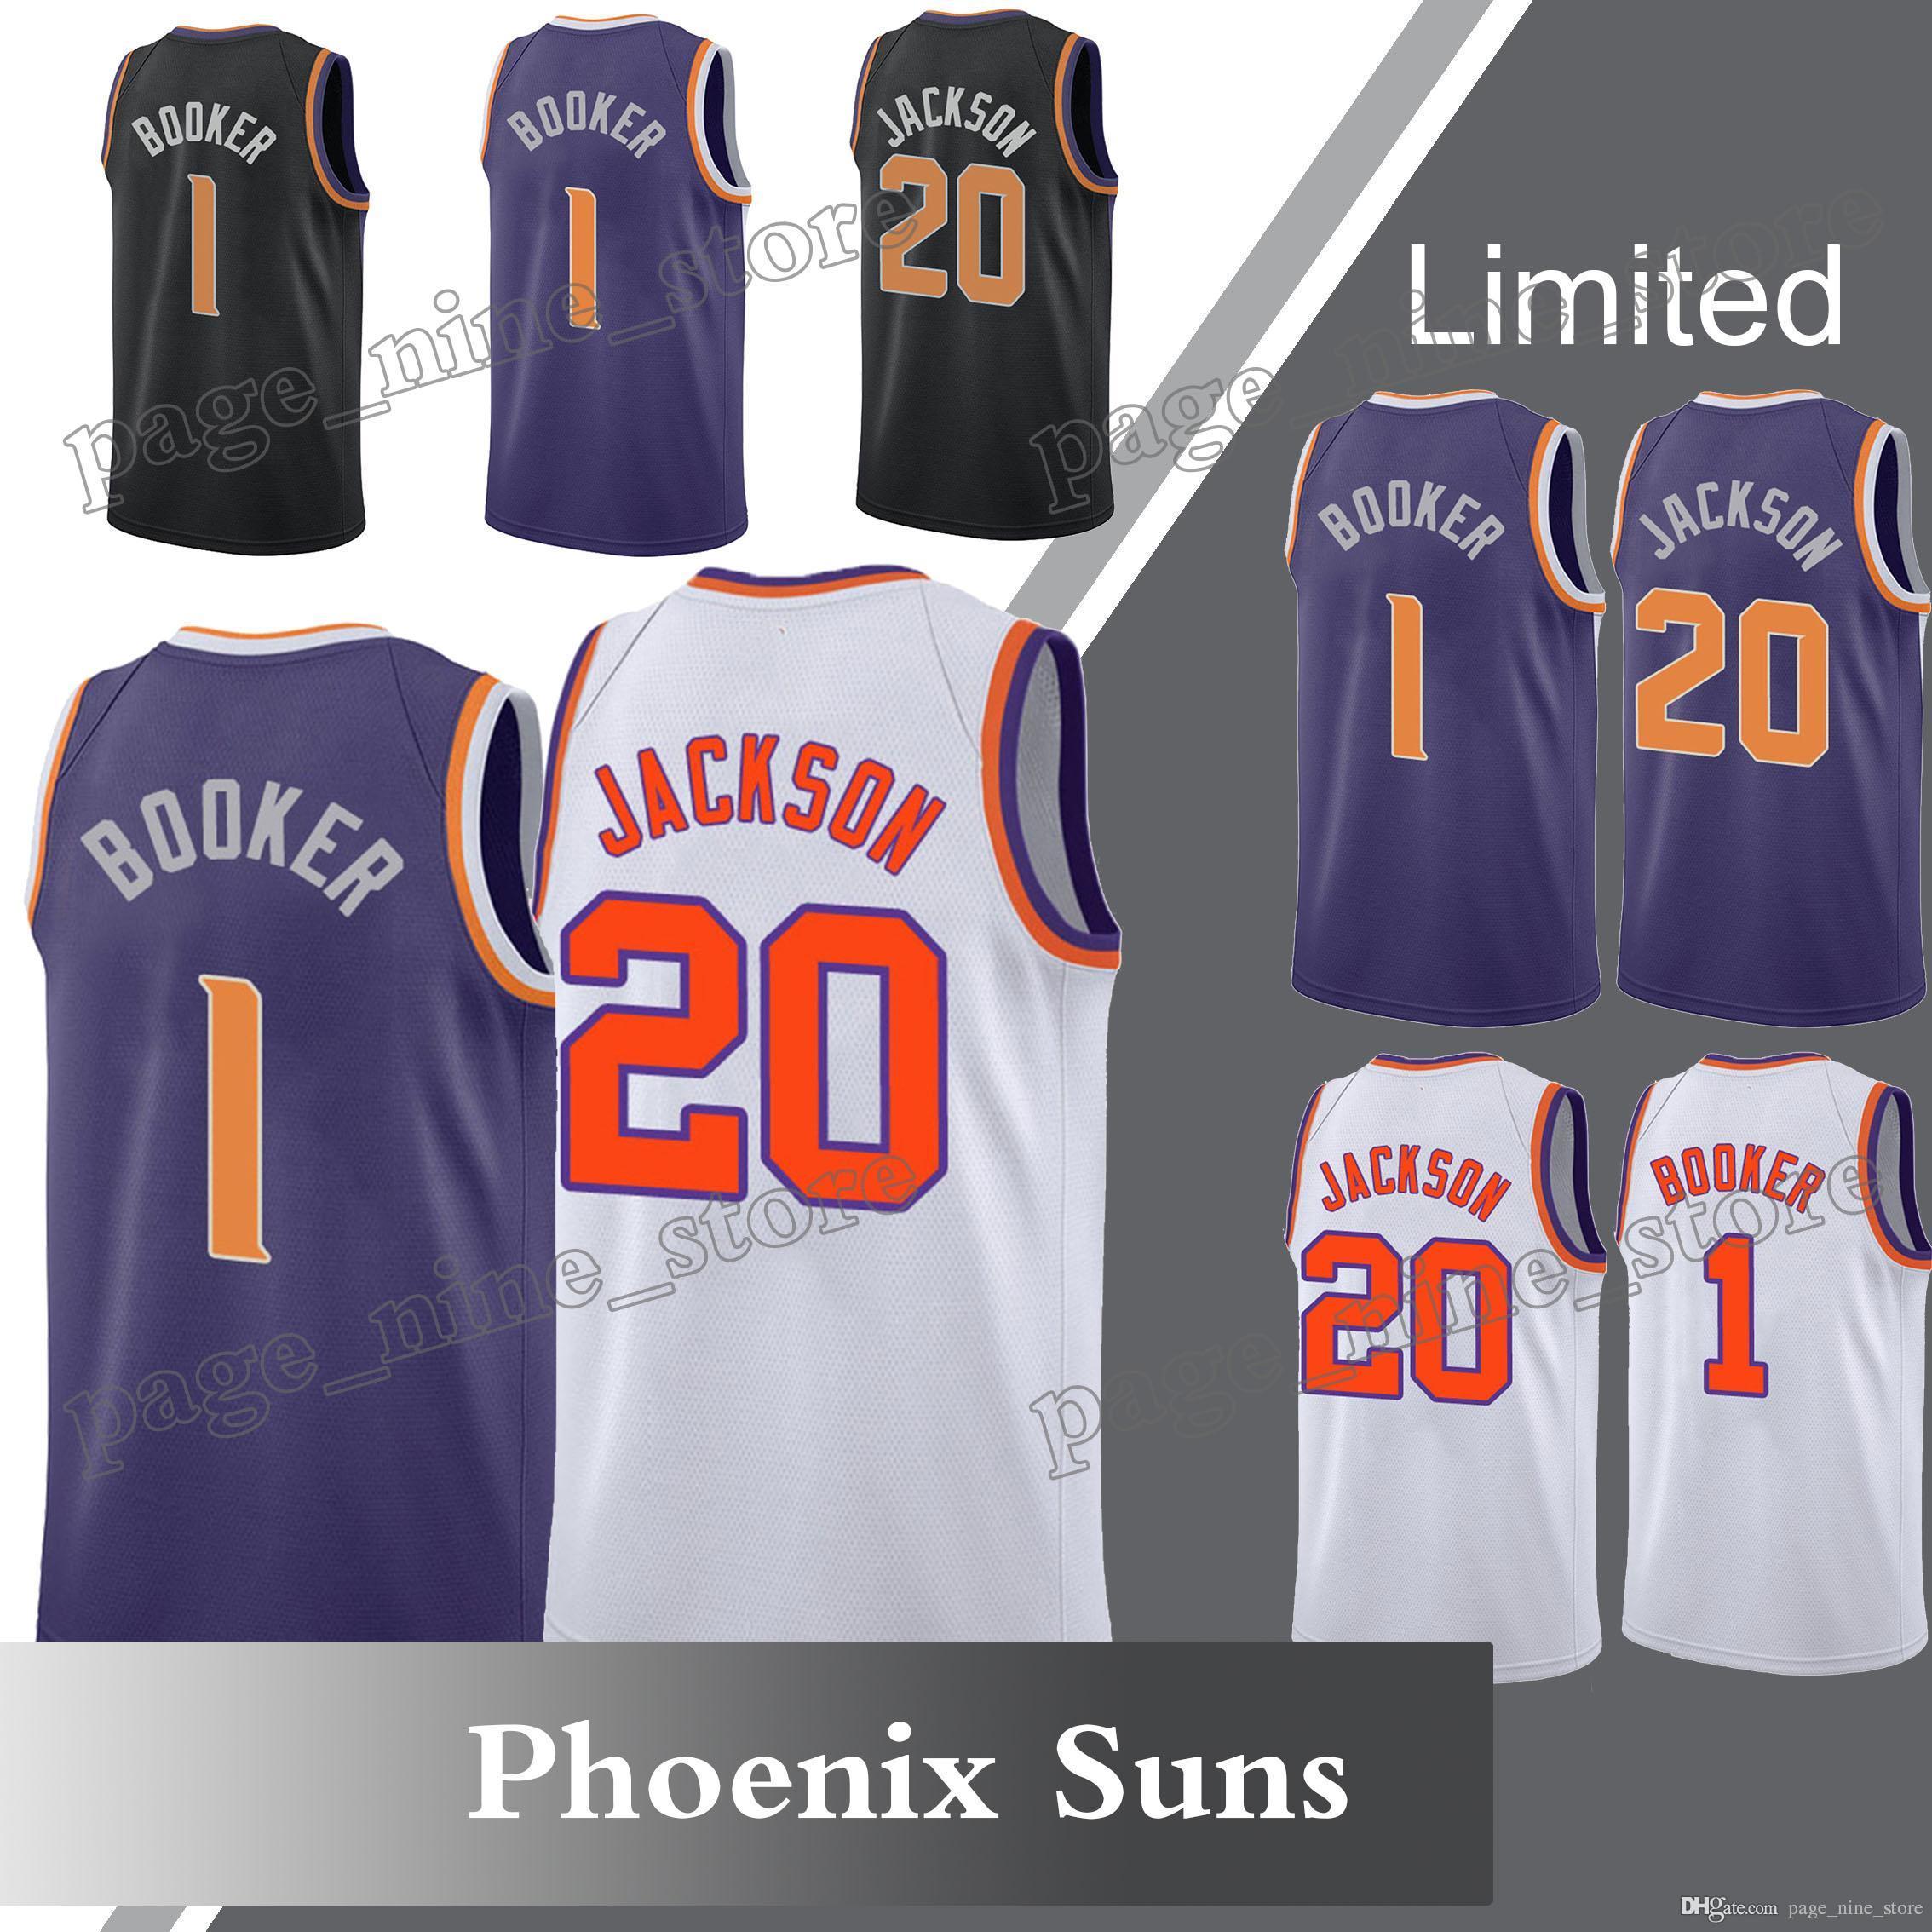 sale retailer 679dc 132e9 Phoenix Suns 1 Devin Booker jersey 22 DeAndre Ayton jersey 20 Josh Jackson  Swingman 2018 Men High-quality Free Shipping